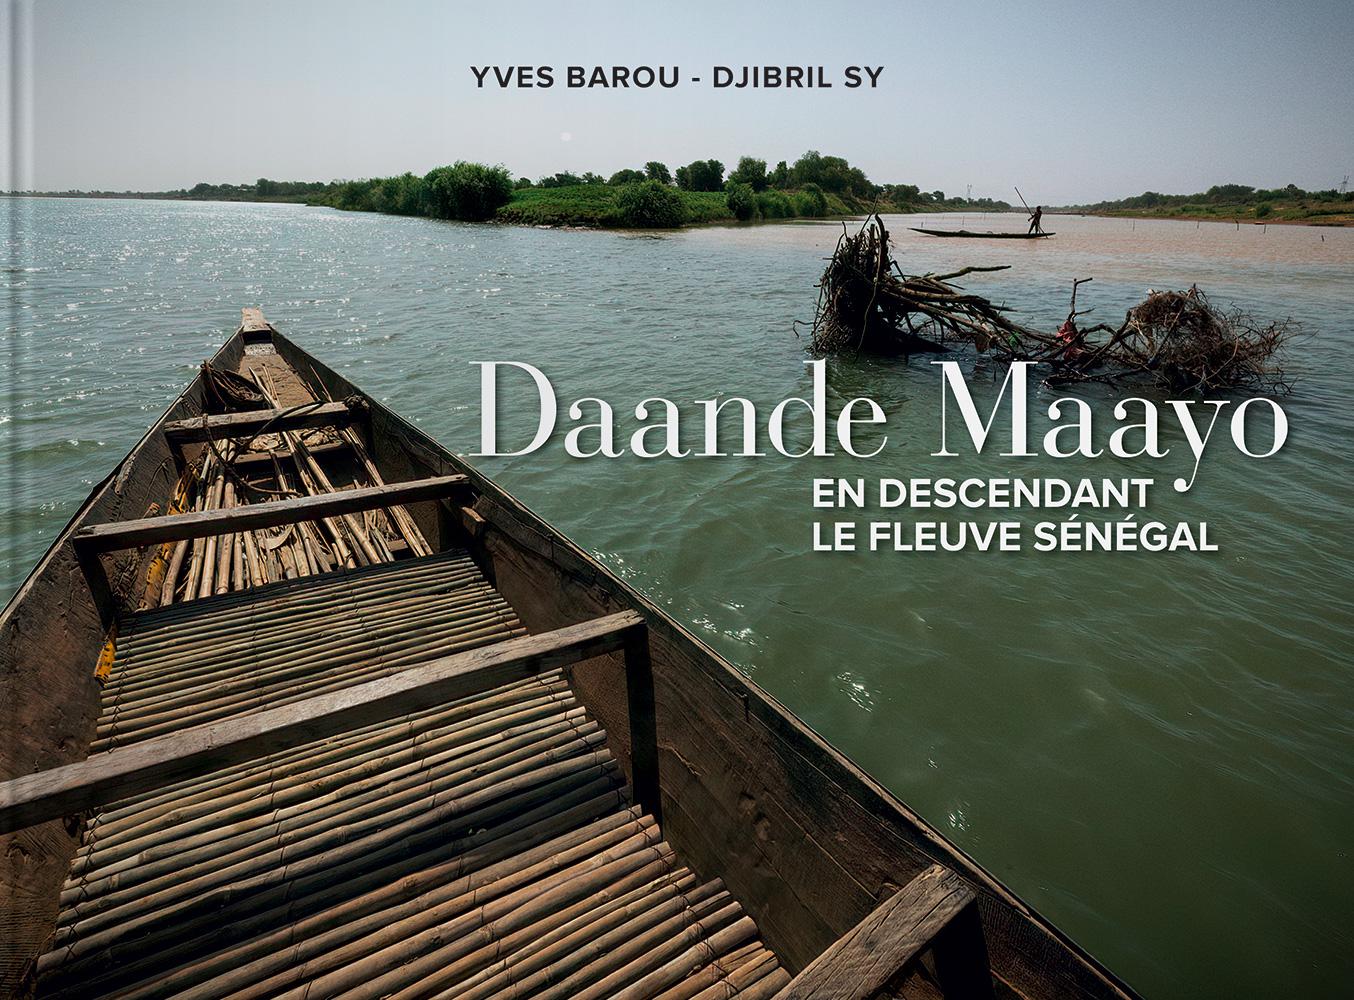 Couverture de l'ouvrage Daande Maayo